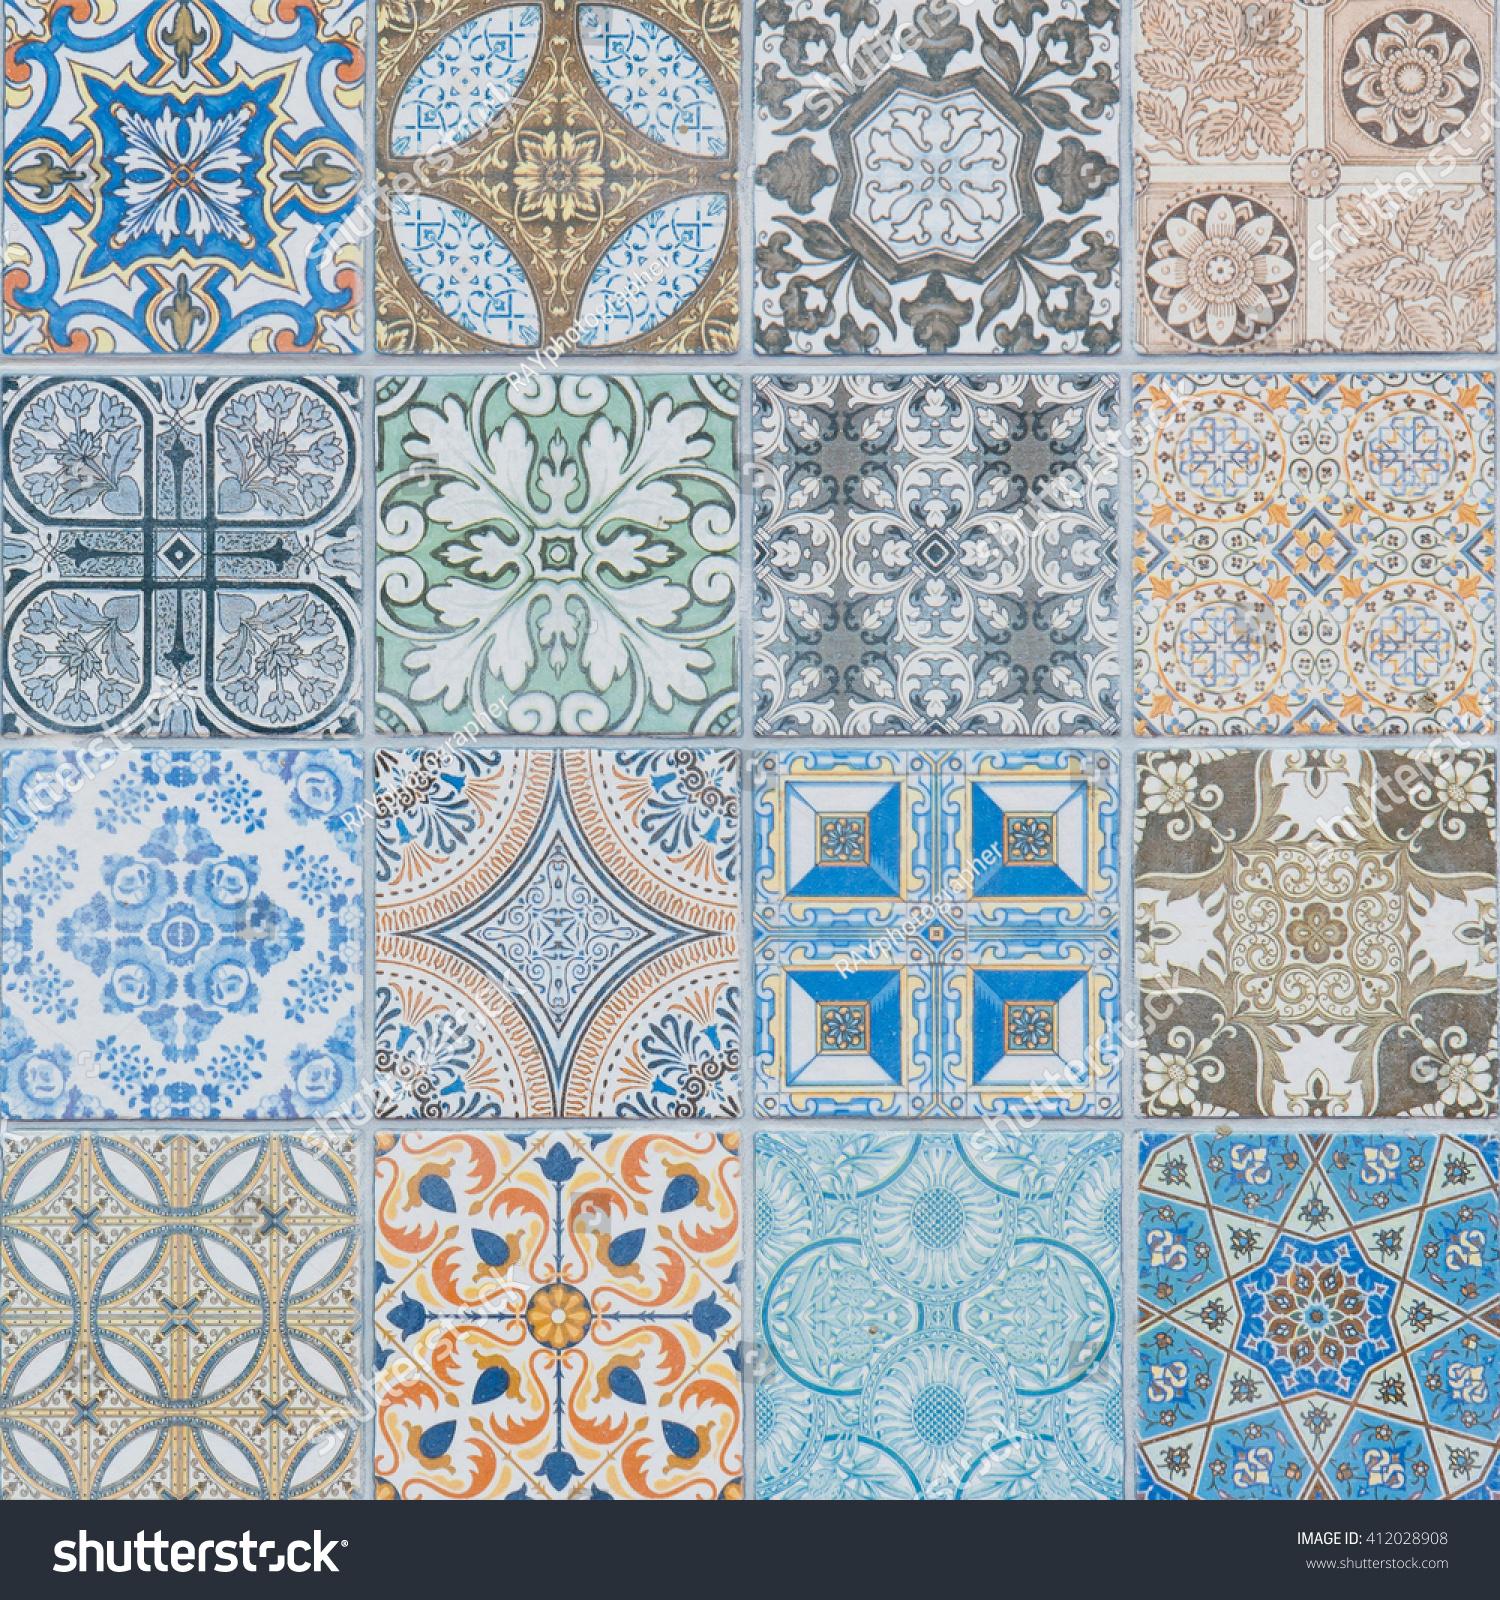 Ceramic Tiles Patterns Stock Photo (Edit Now) 412028908 - Shutterstock